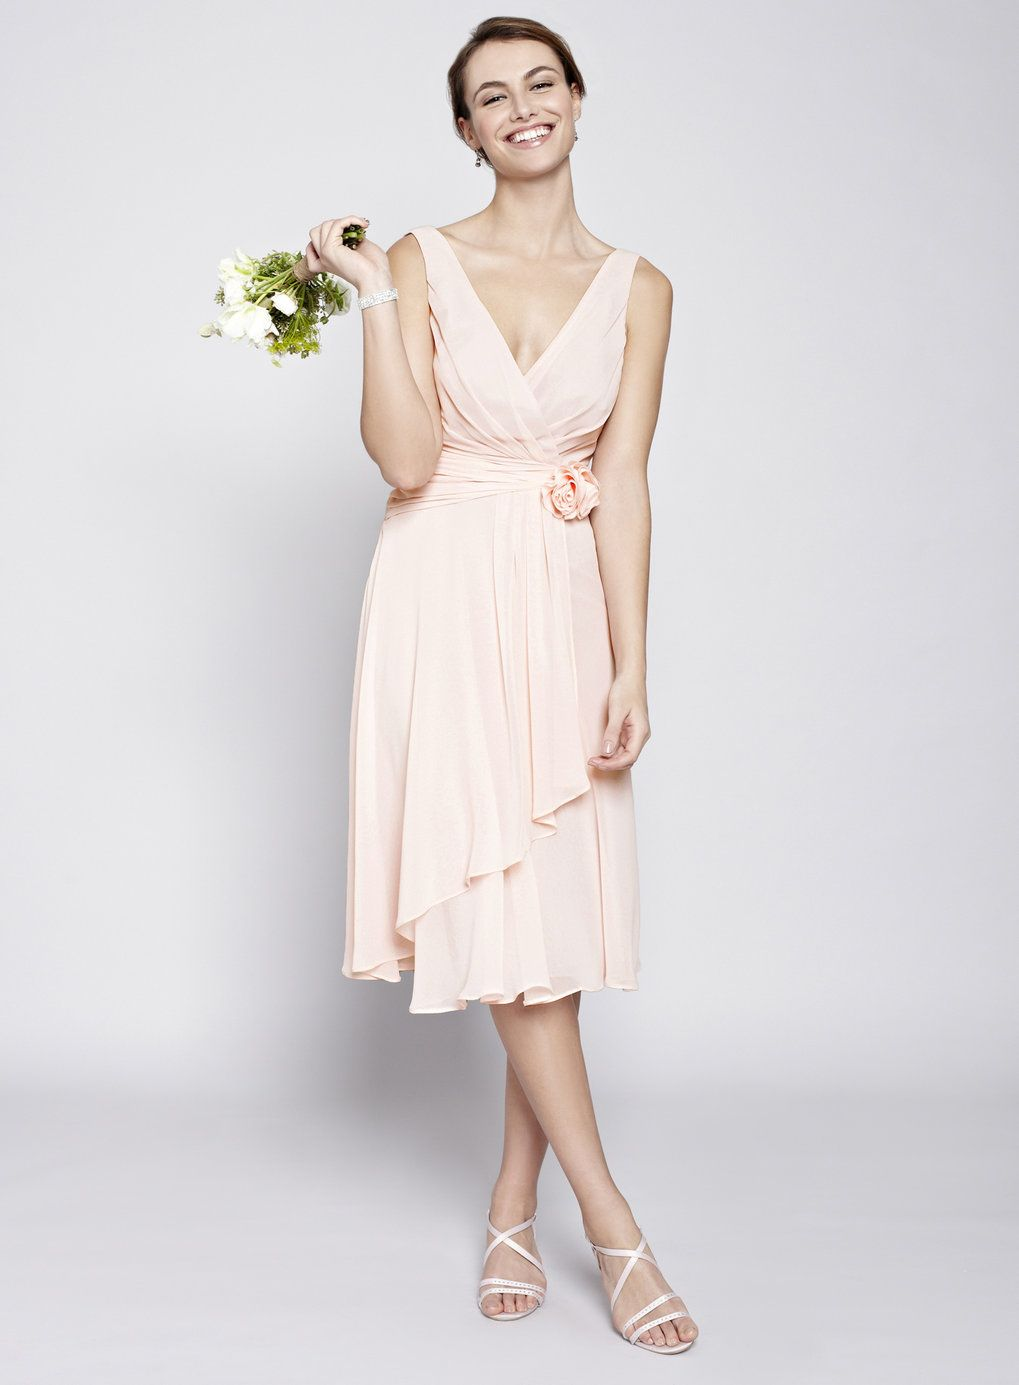 Blush amber short bridesmaid dress bhs silver blush taupe blush amber short bridesmaid dress bhs ombrellifo Images